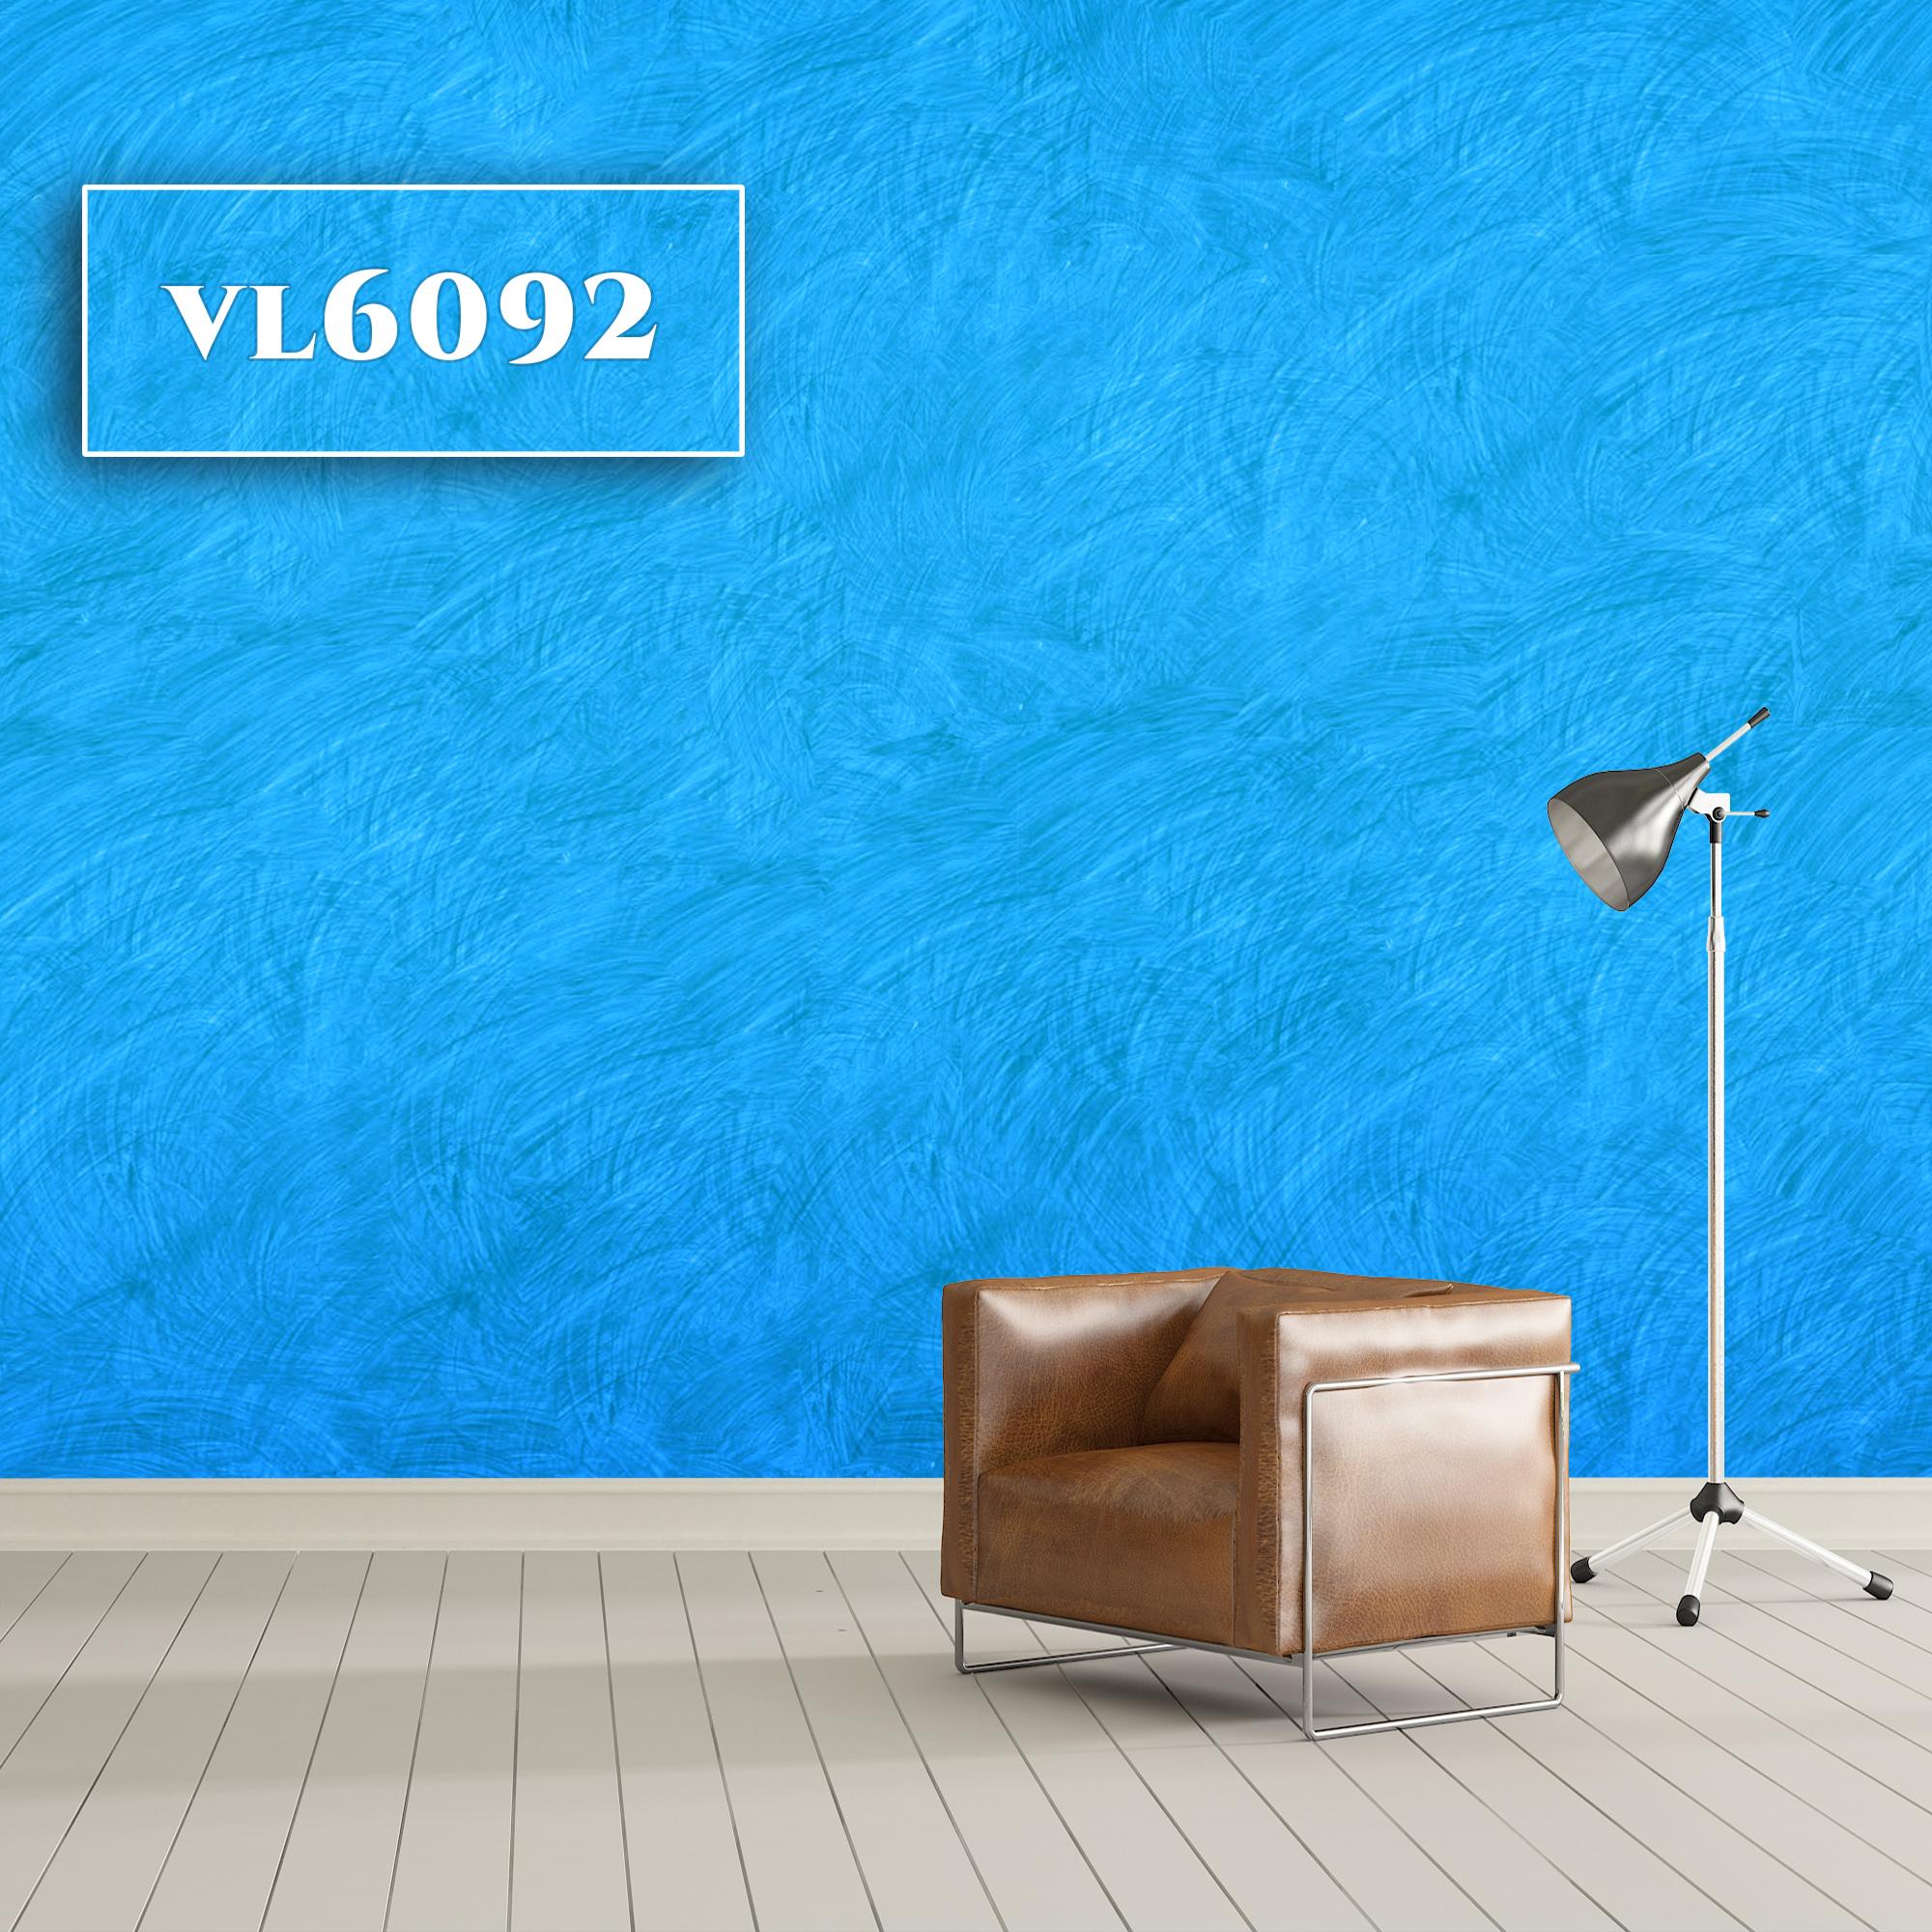 VL6092